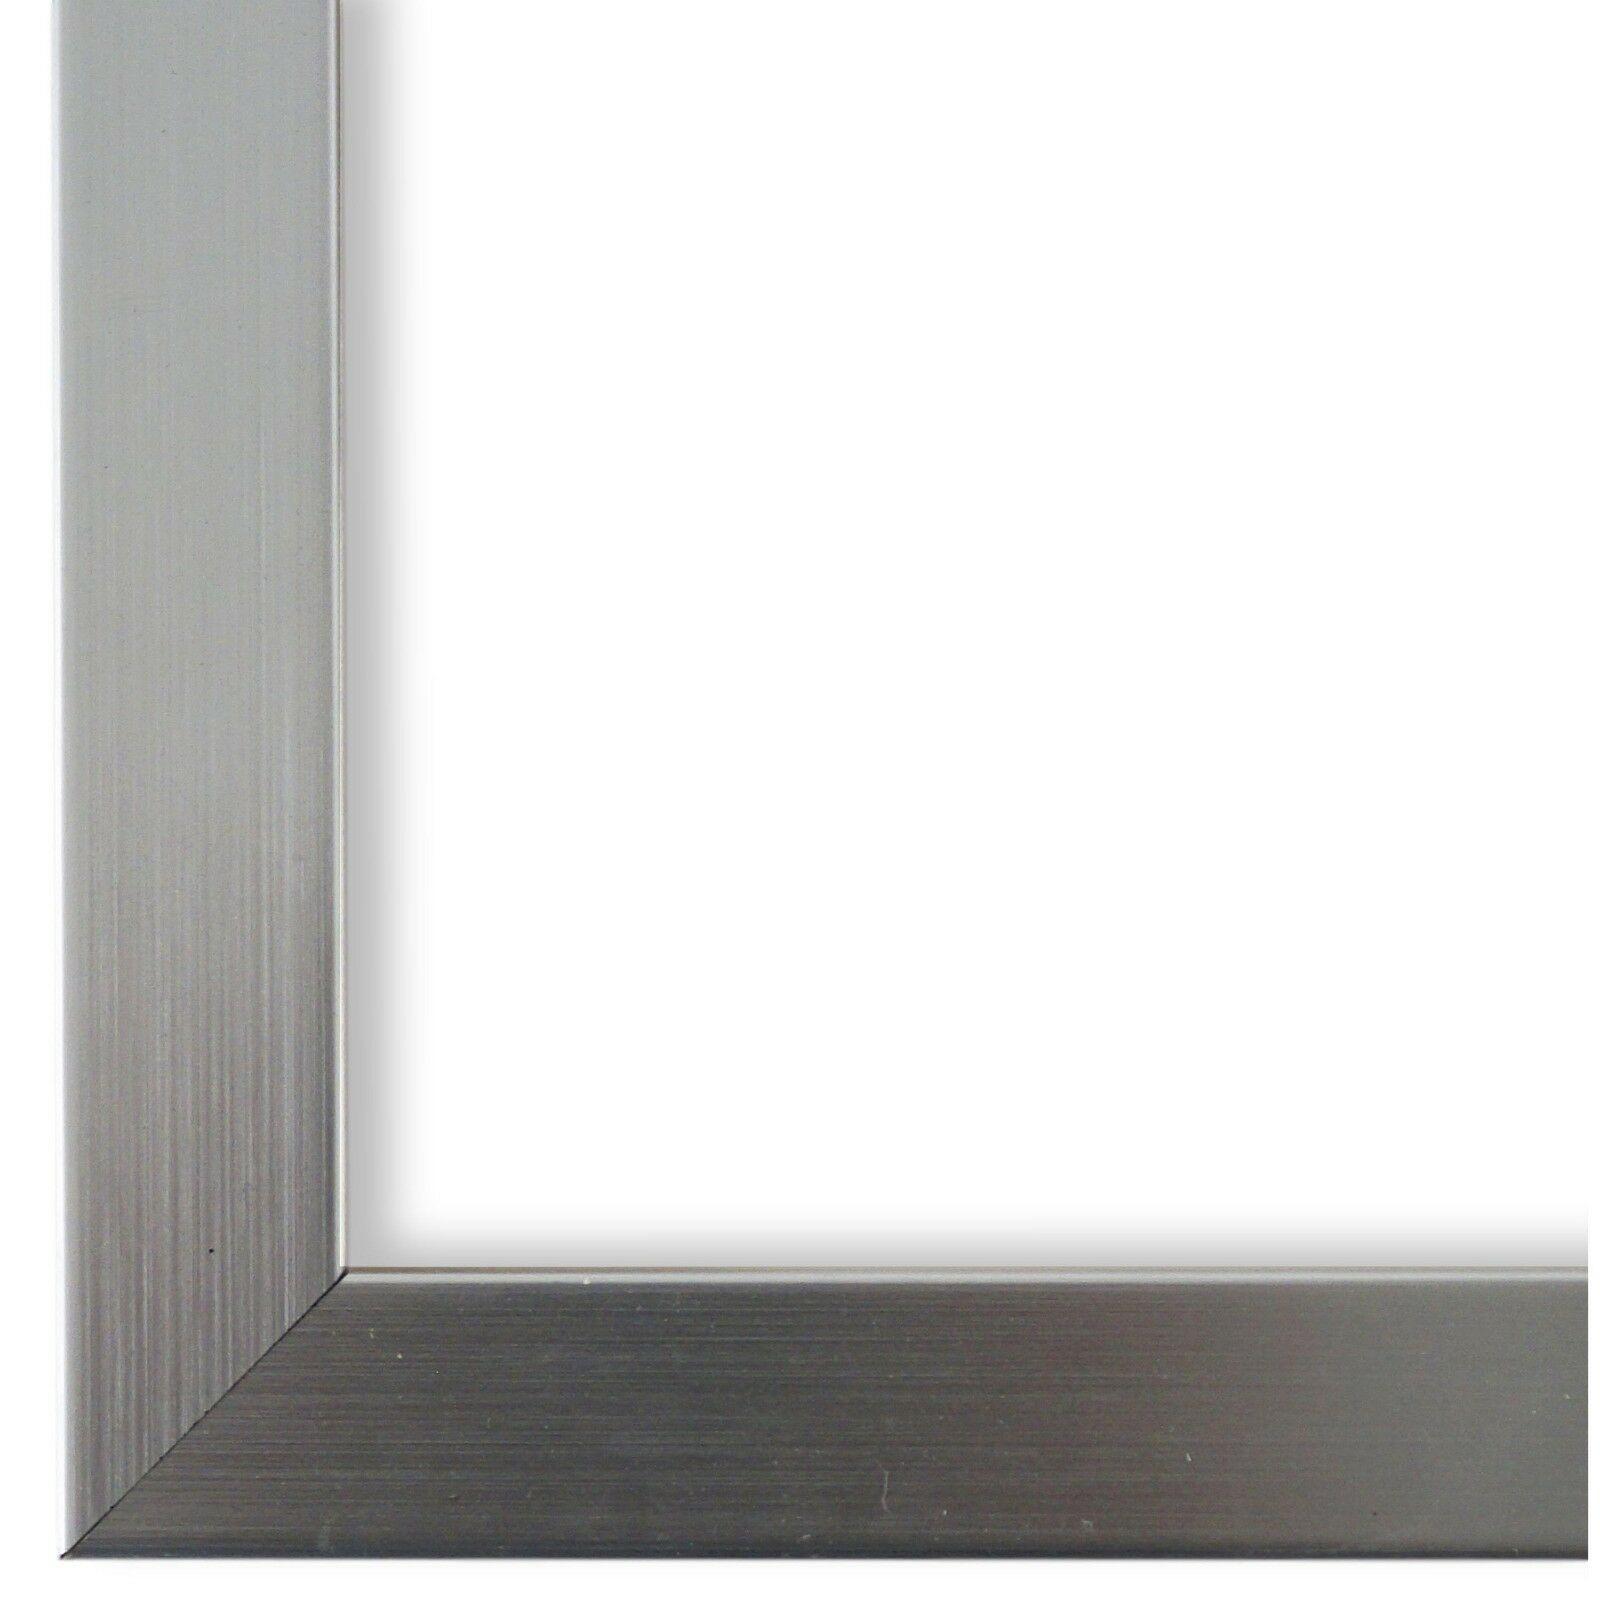 DIN A2 Bilderrahmen Silber Holz Lecce 3,9 DIN A3 DIN A4 DIN A5